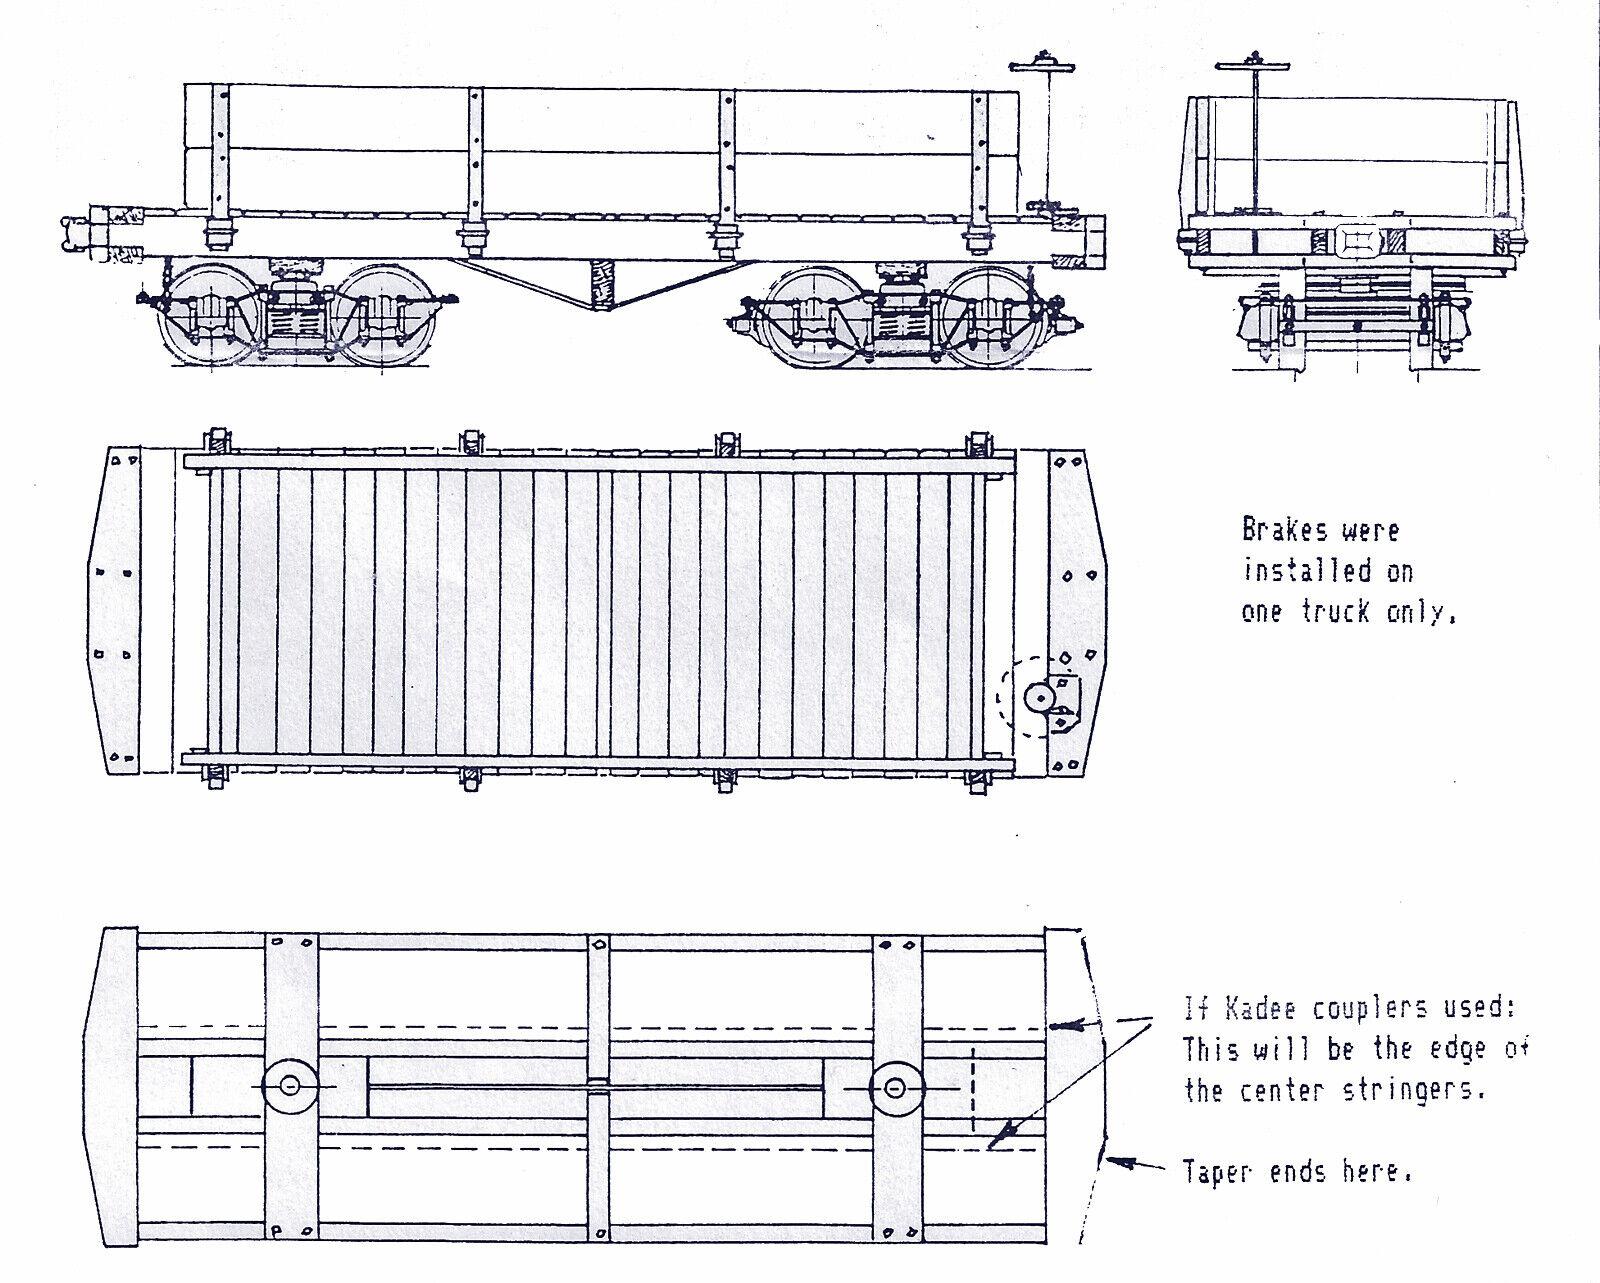 ventas en línea de venta Mina de bonificación Company 2' calibre 16' Gondola On2 On2 On2 kit de artesano FerroCocheril Modelo TC7985  100% garantía genuina de contador